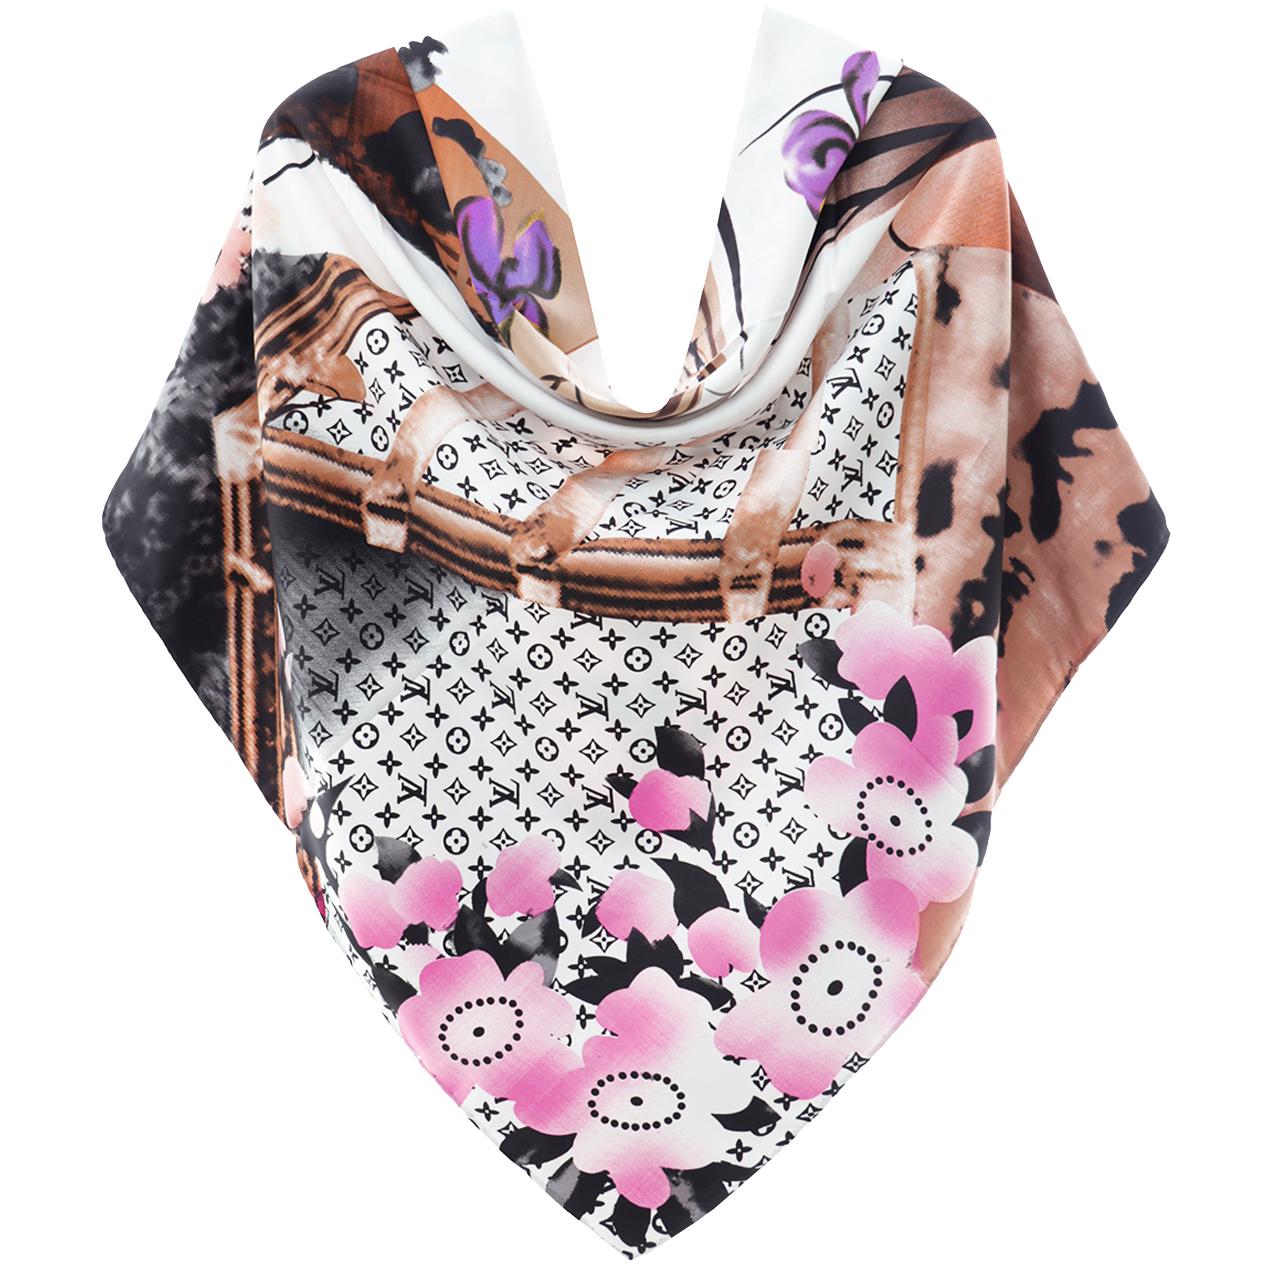 تصویر روسری زنانه کد Tp_44299-55